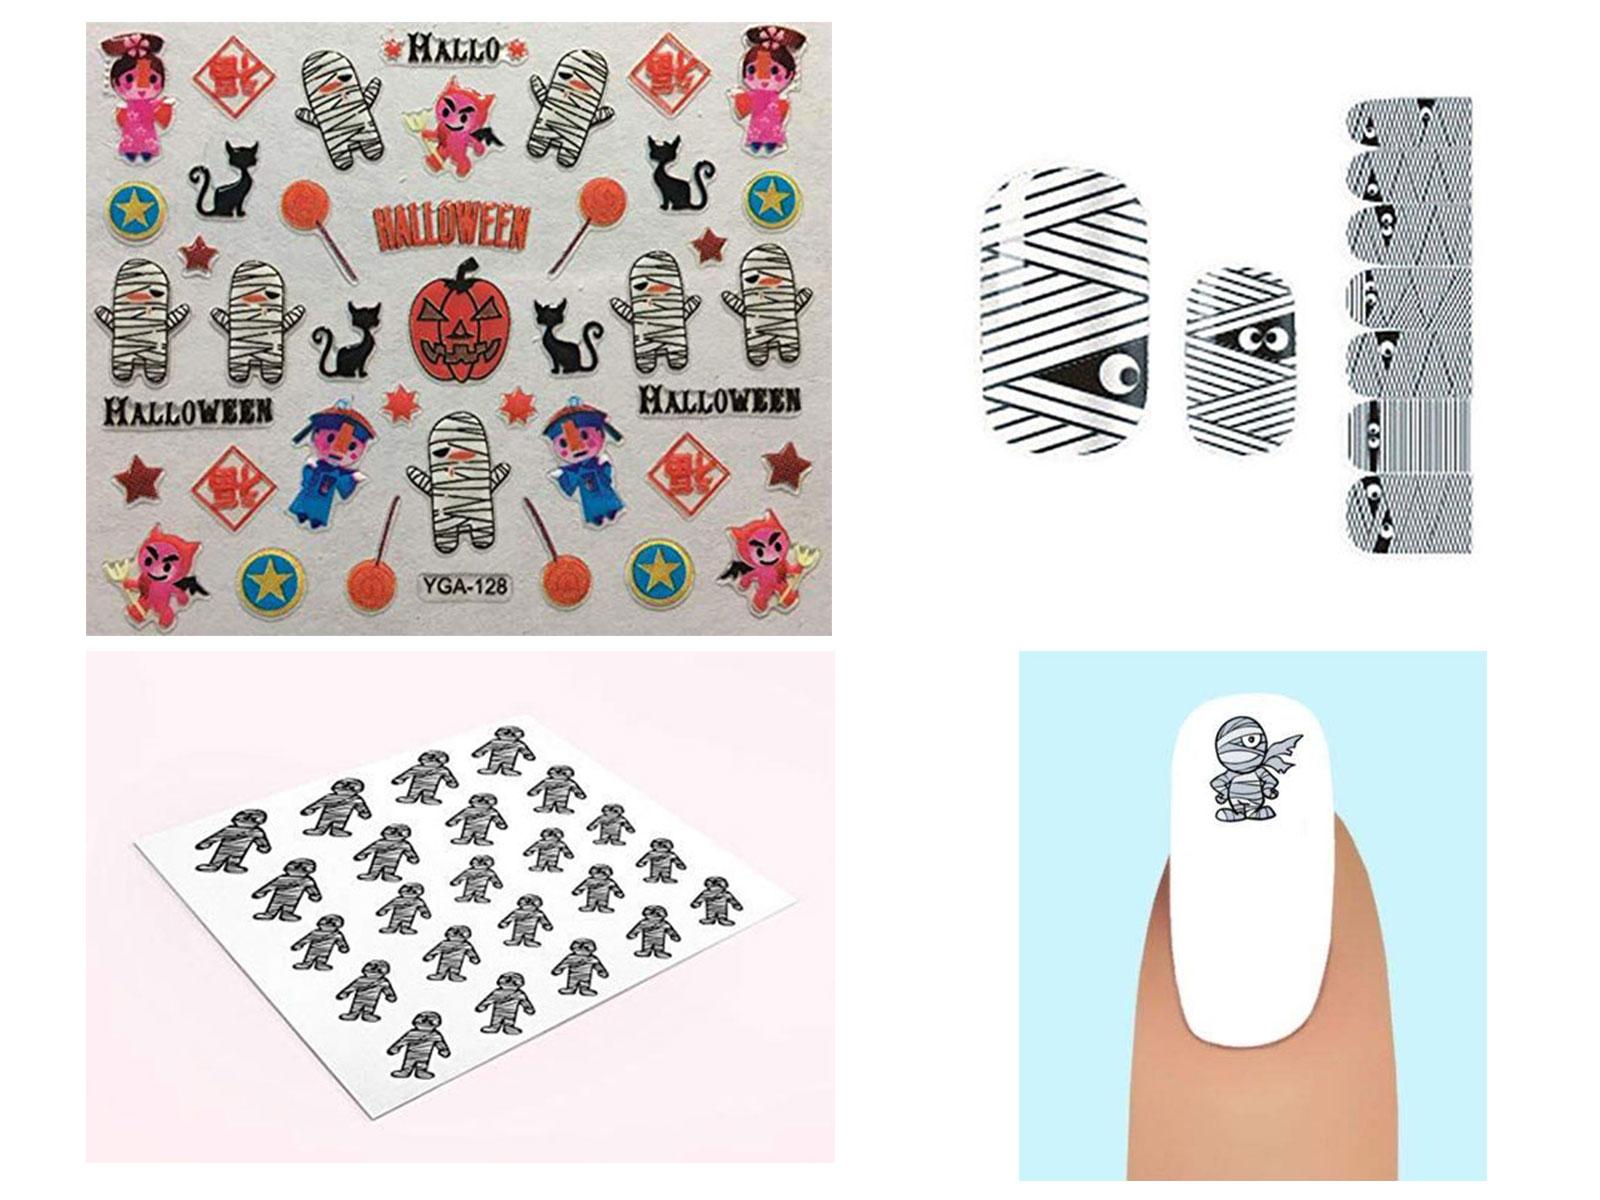 Halloween-Mummy-Nail-Art-Stickers-Decals-Designs-Trends-2019-F